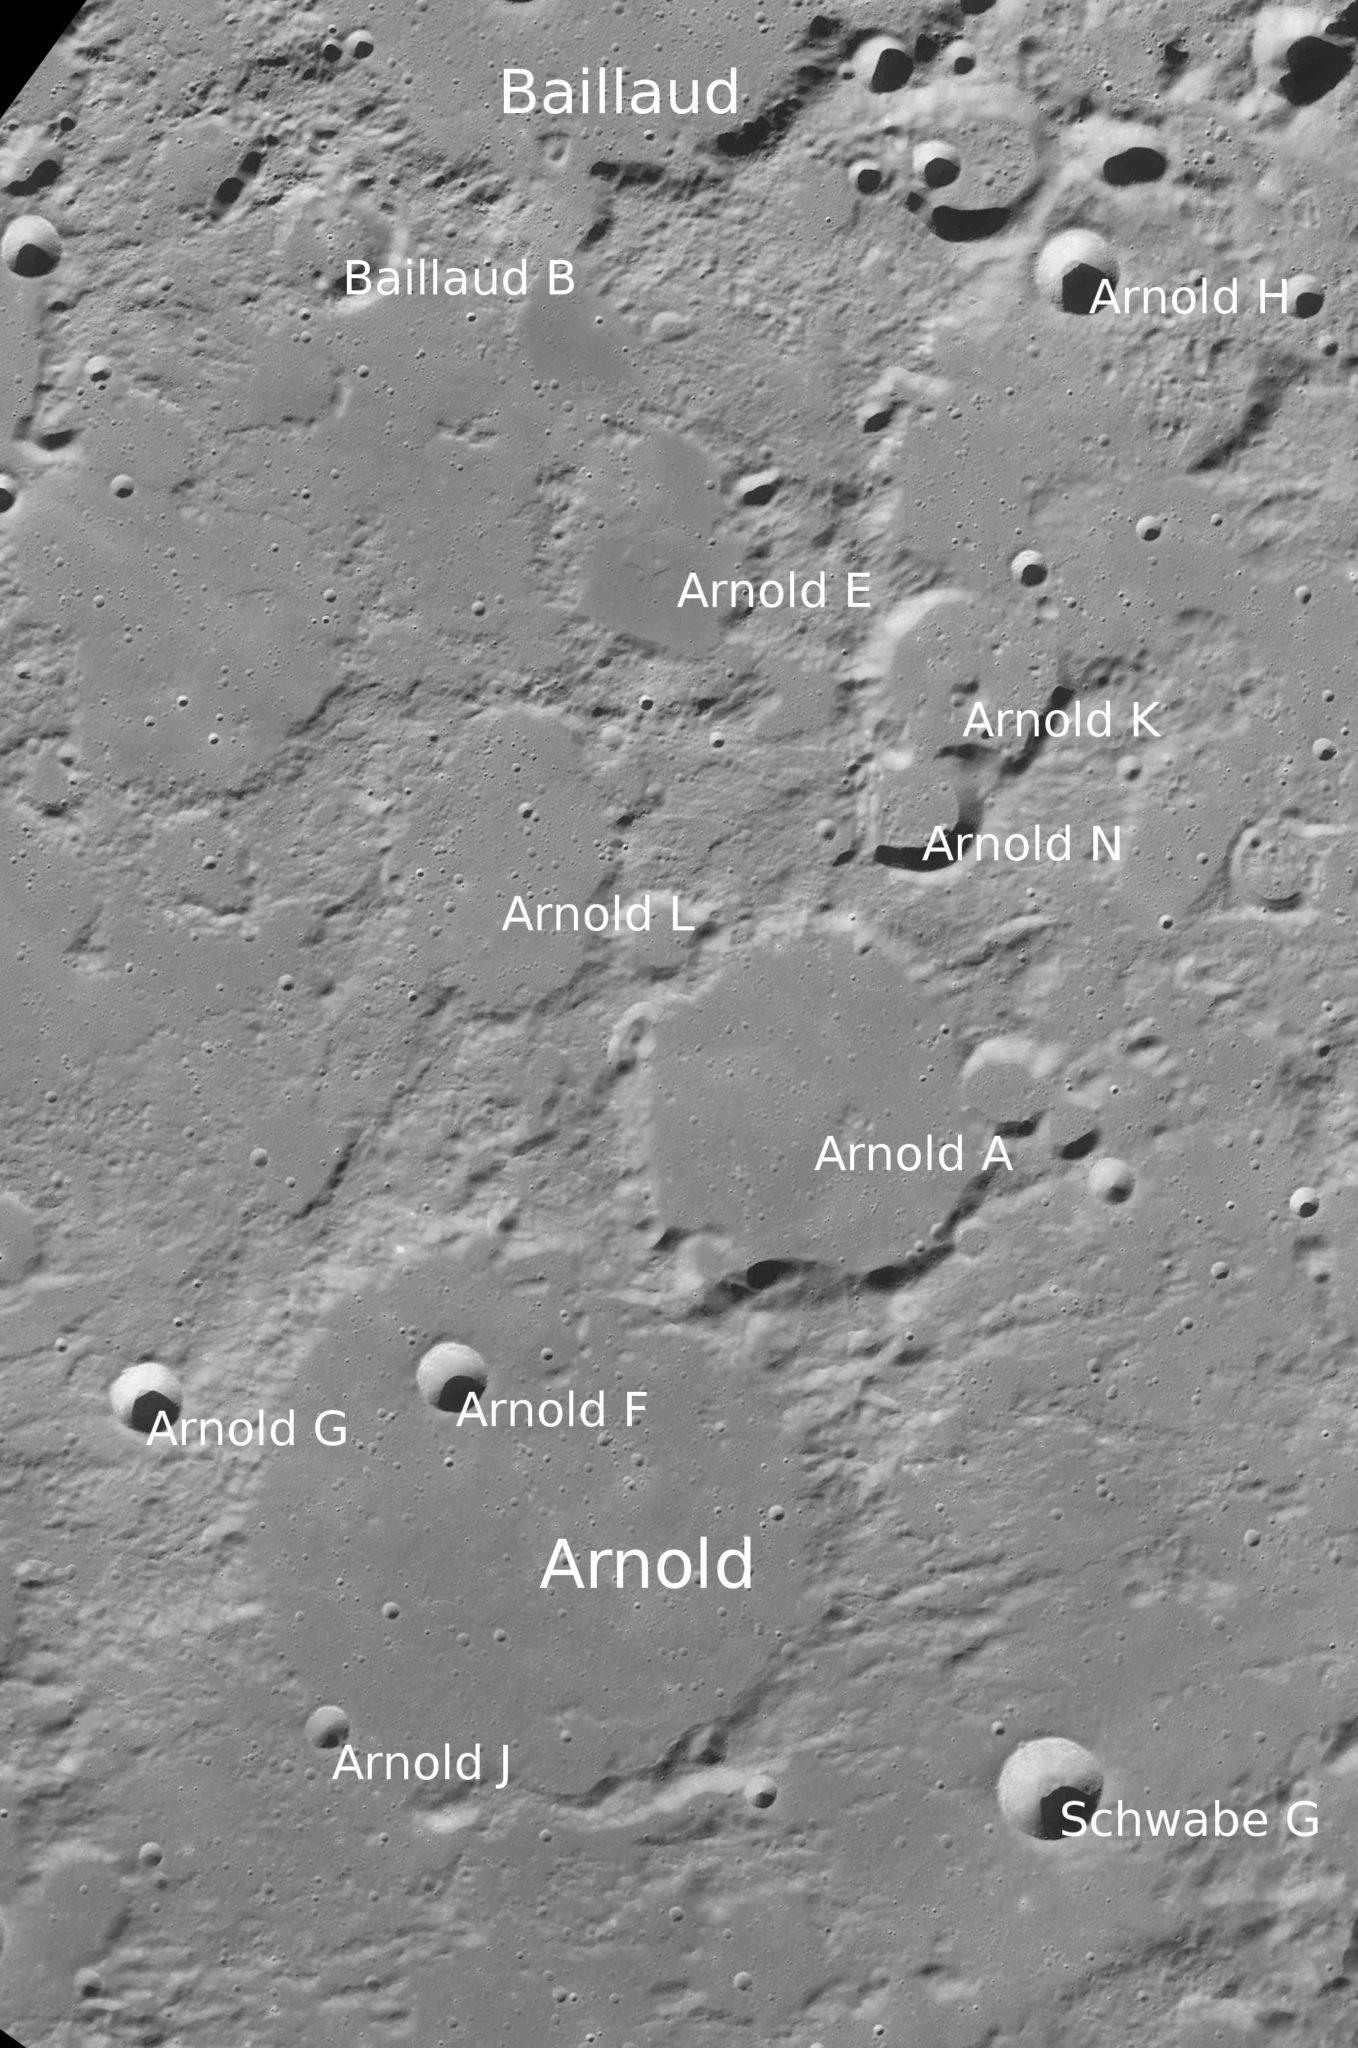 001-Arnold_-_LROC_-_WAC_-_Lettering